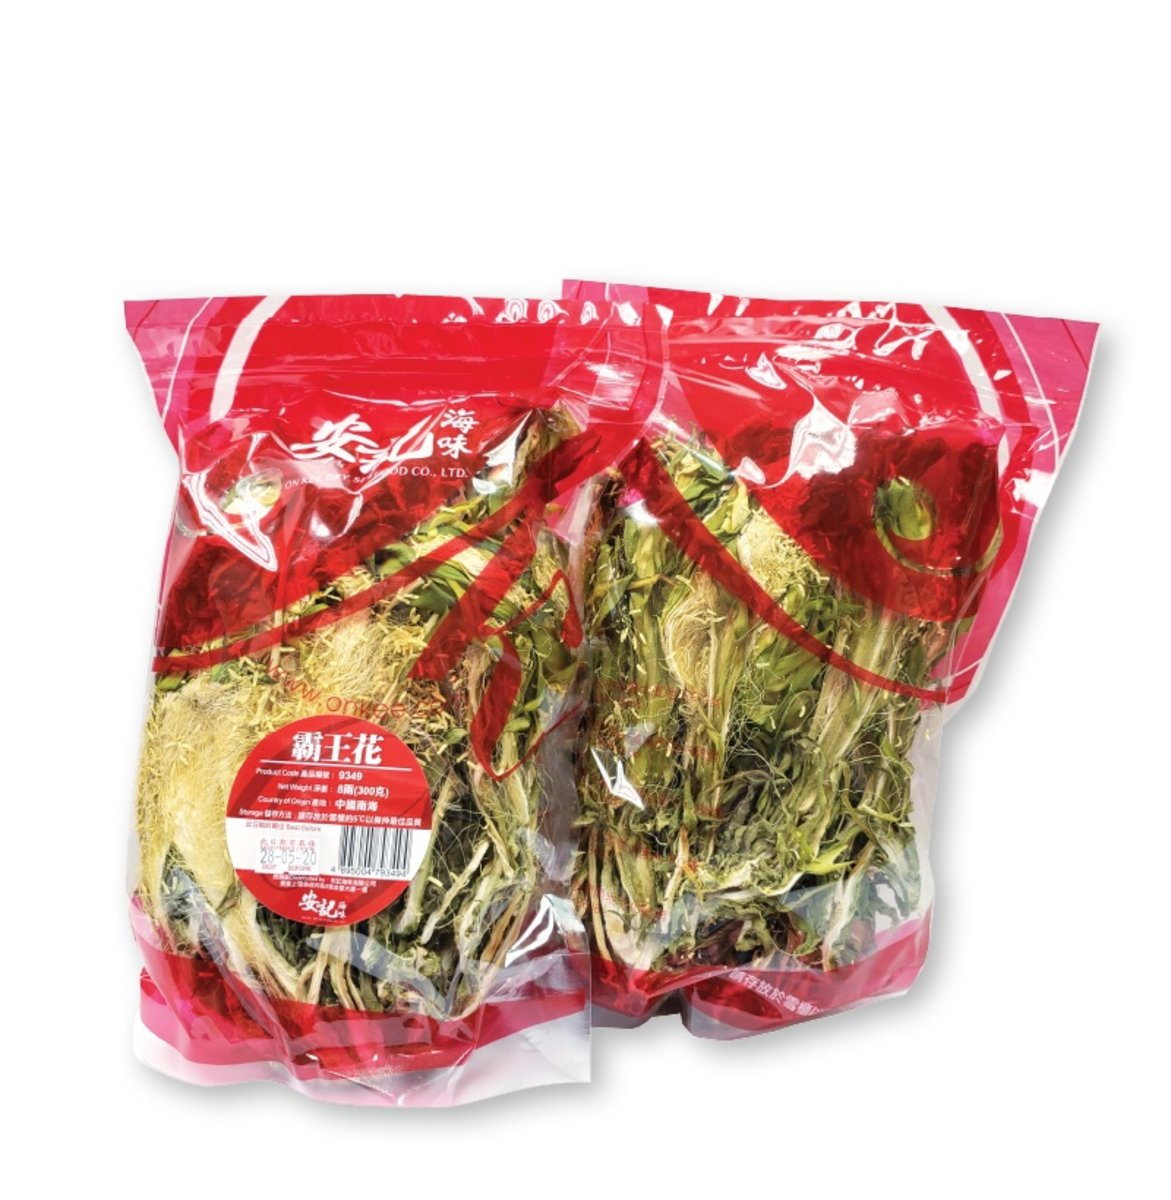 Night Blooming Cereus (300g) - 2 Packs Set